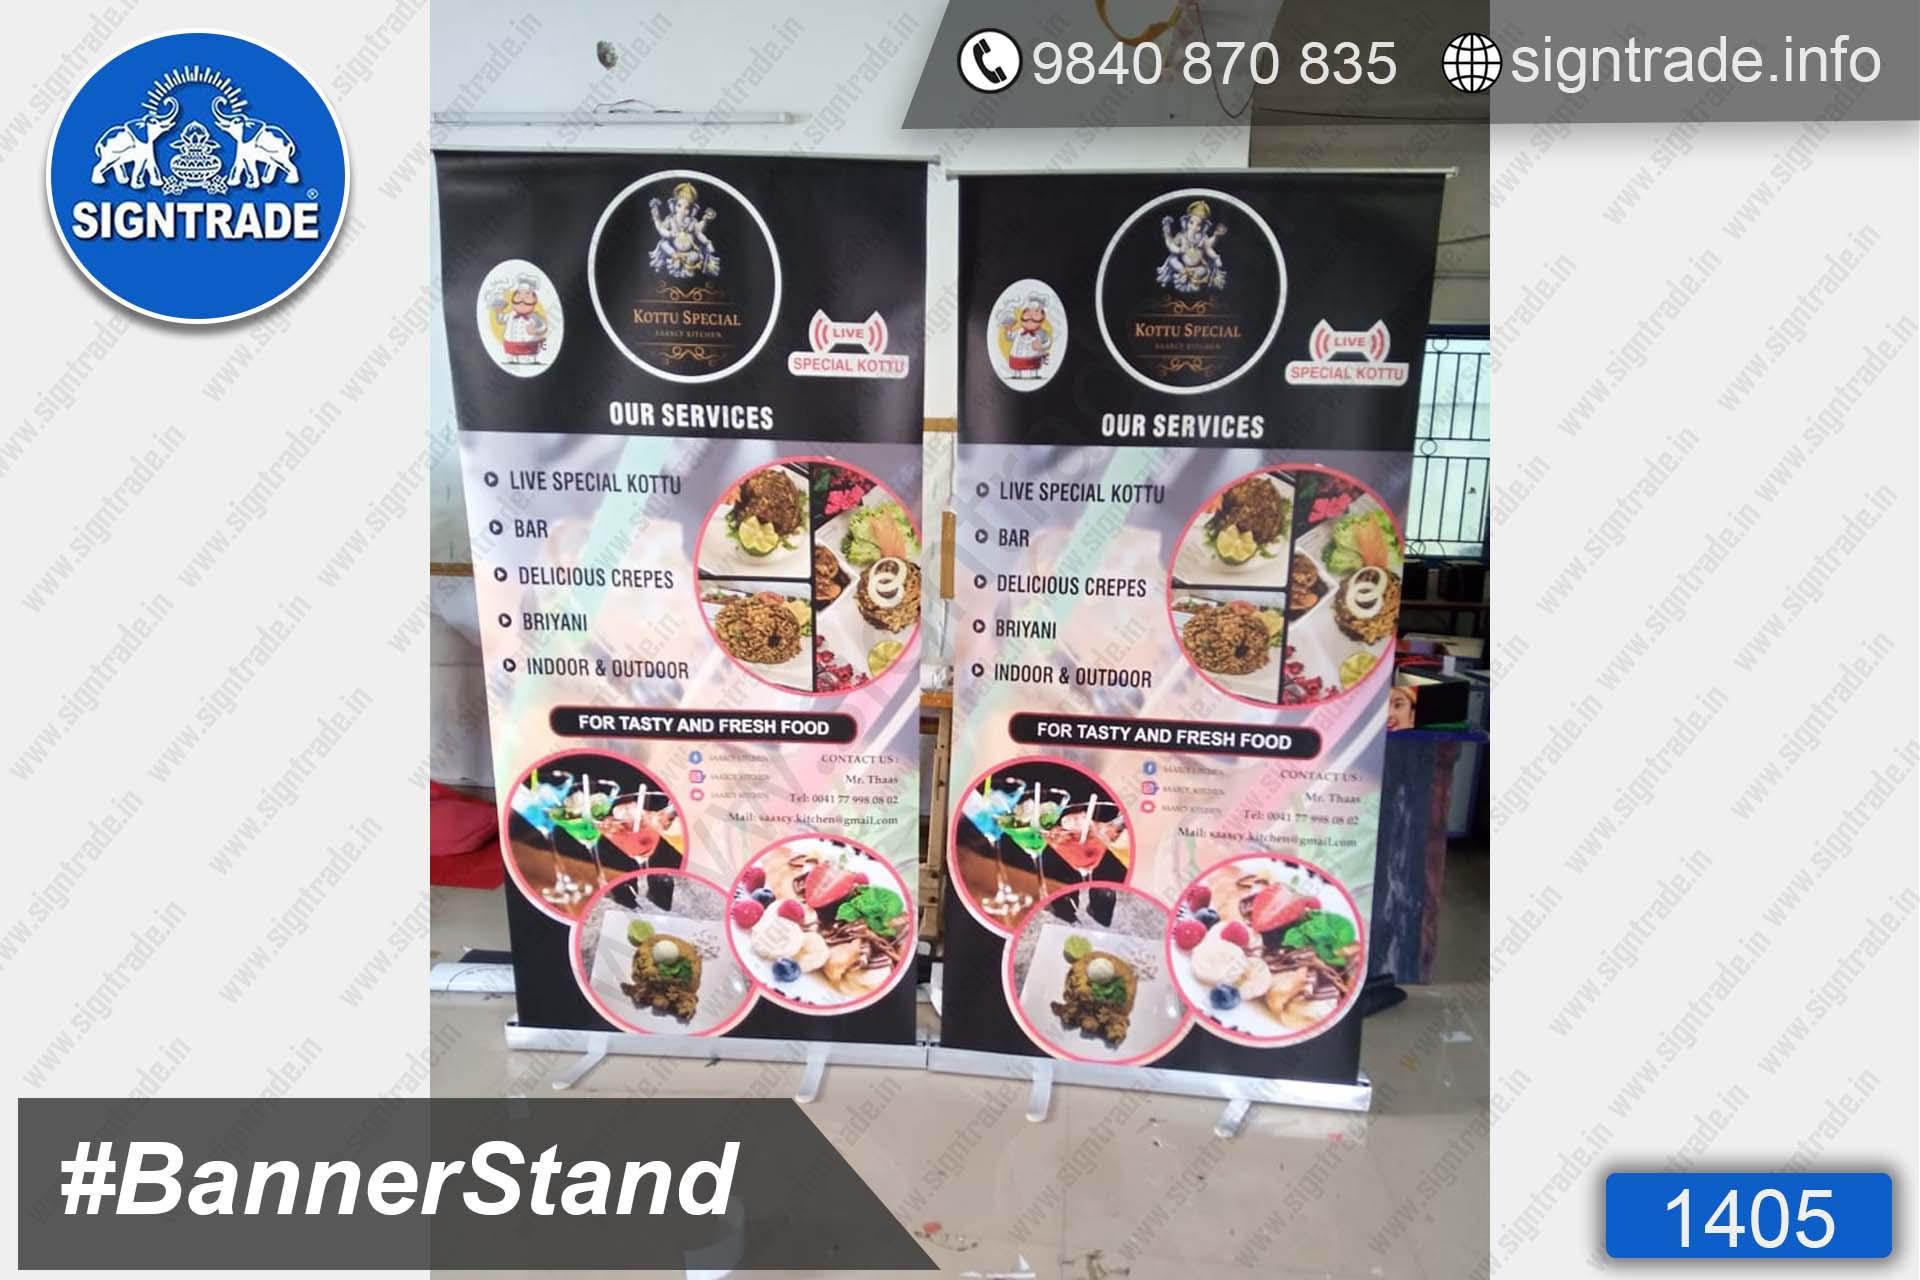 Kottu Special Family Restaurant - 1405, Retractable Banner, Roll Up Banner Stand, Banner Stand, Roll Up Banner, Standee, Promotional Standee, Promotional Roll Up Standee, Promo Standee